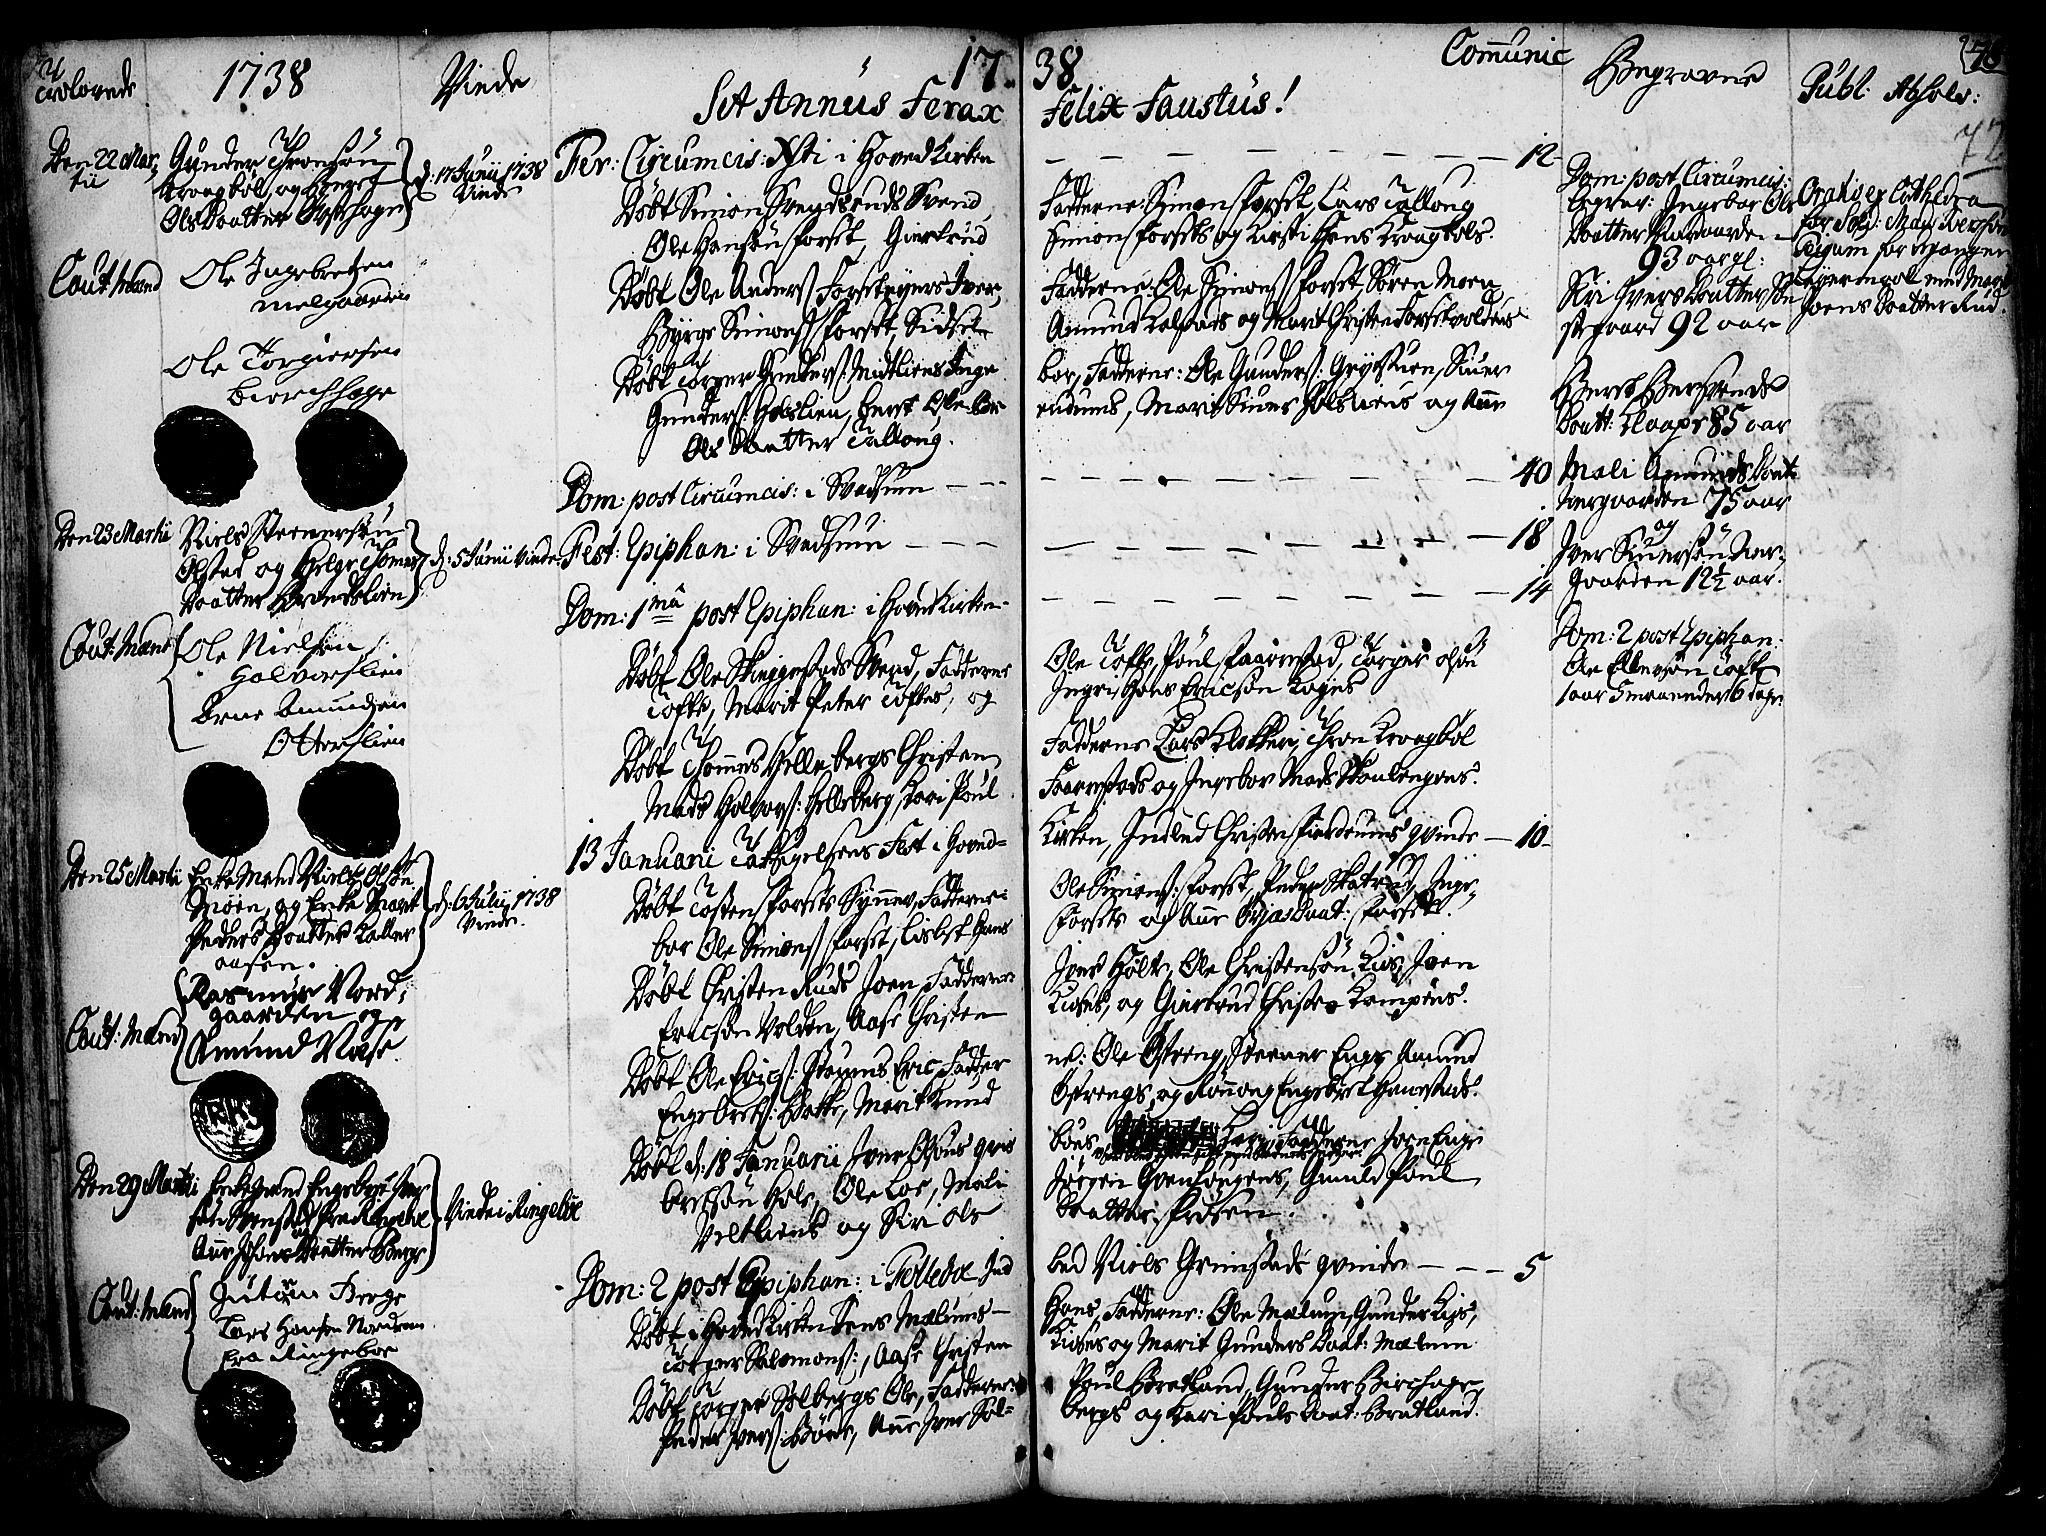 SAH, Gausdal prestekontor, Ministerialbok nr. 2, 1729-1757, s. 72